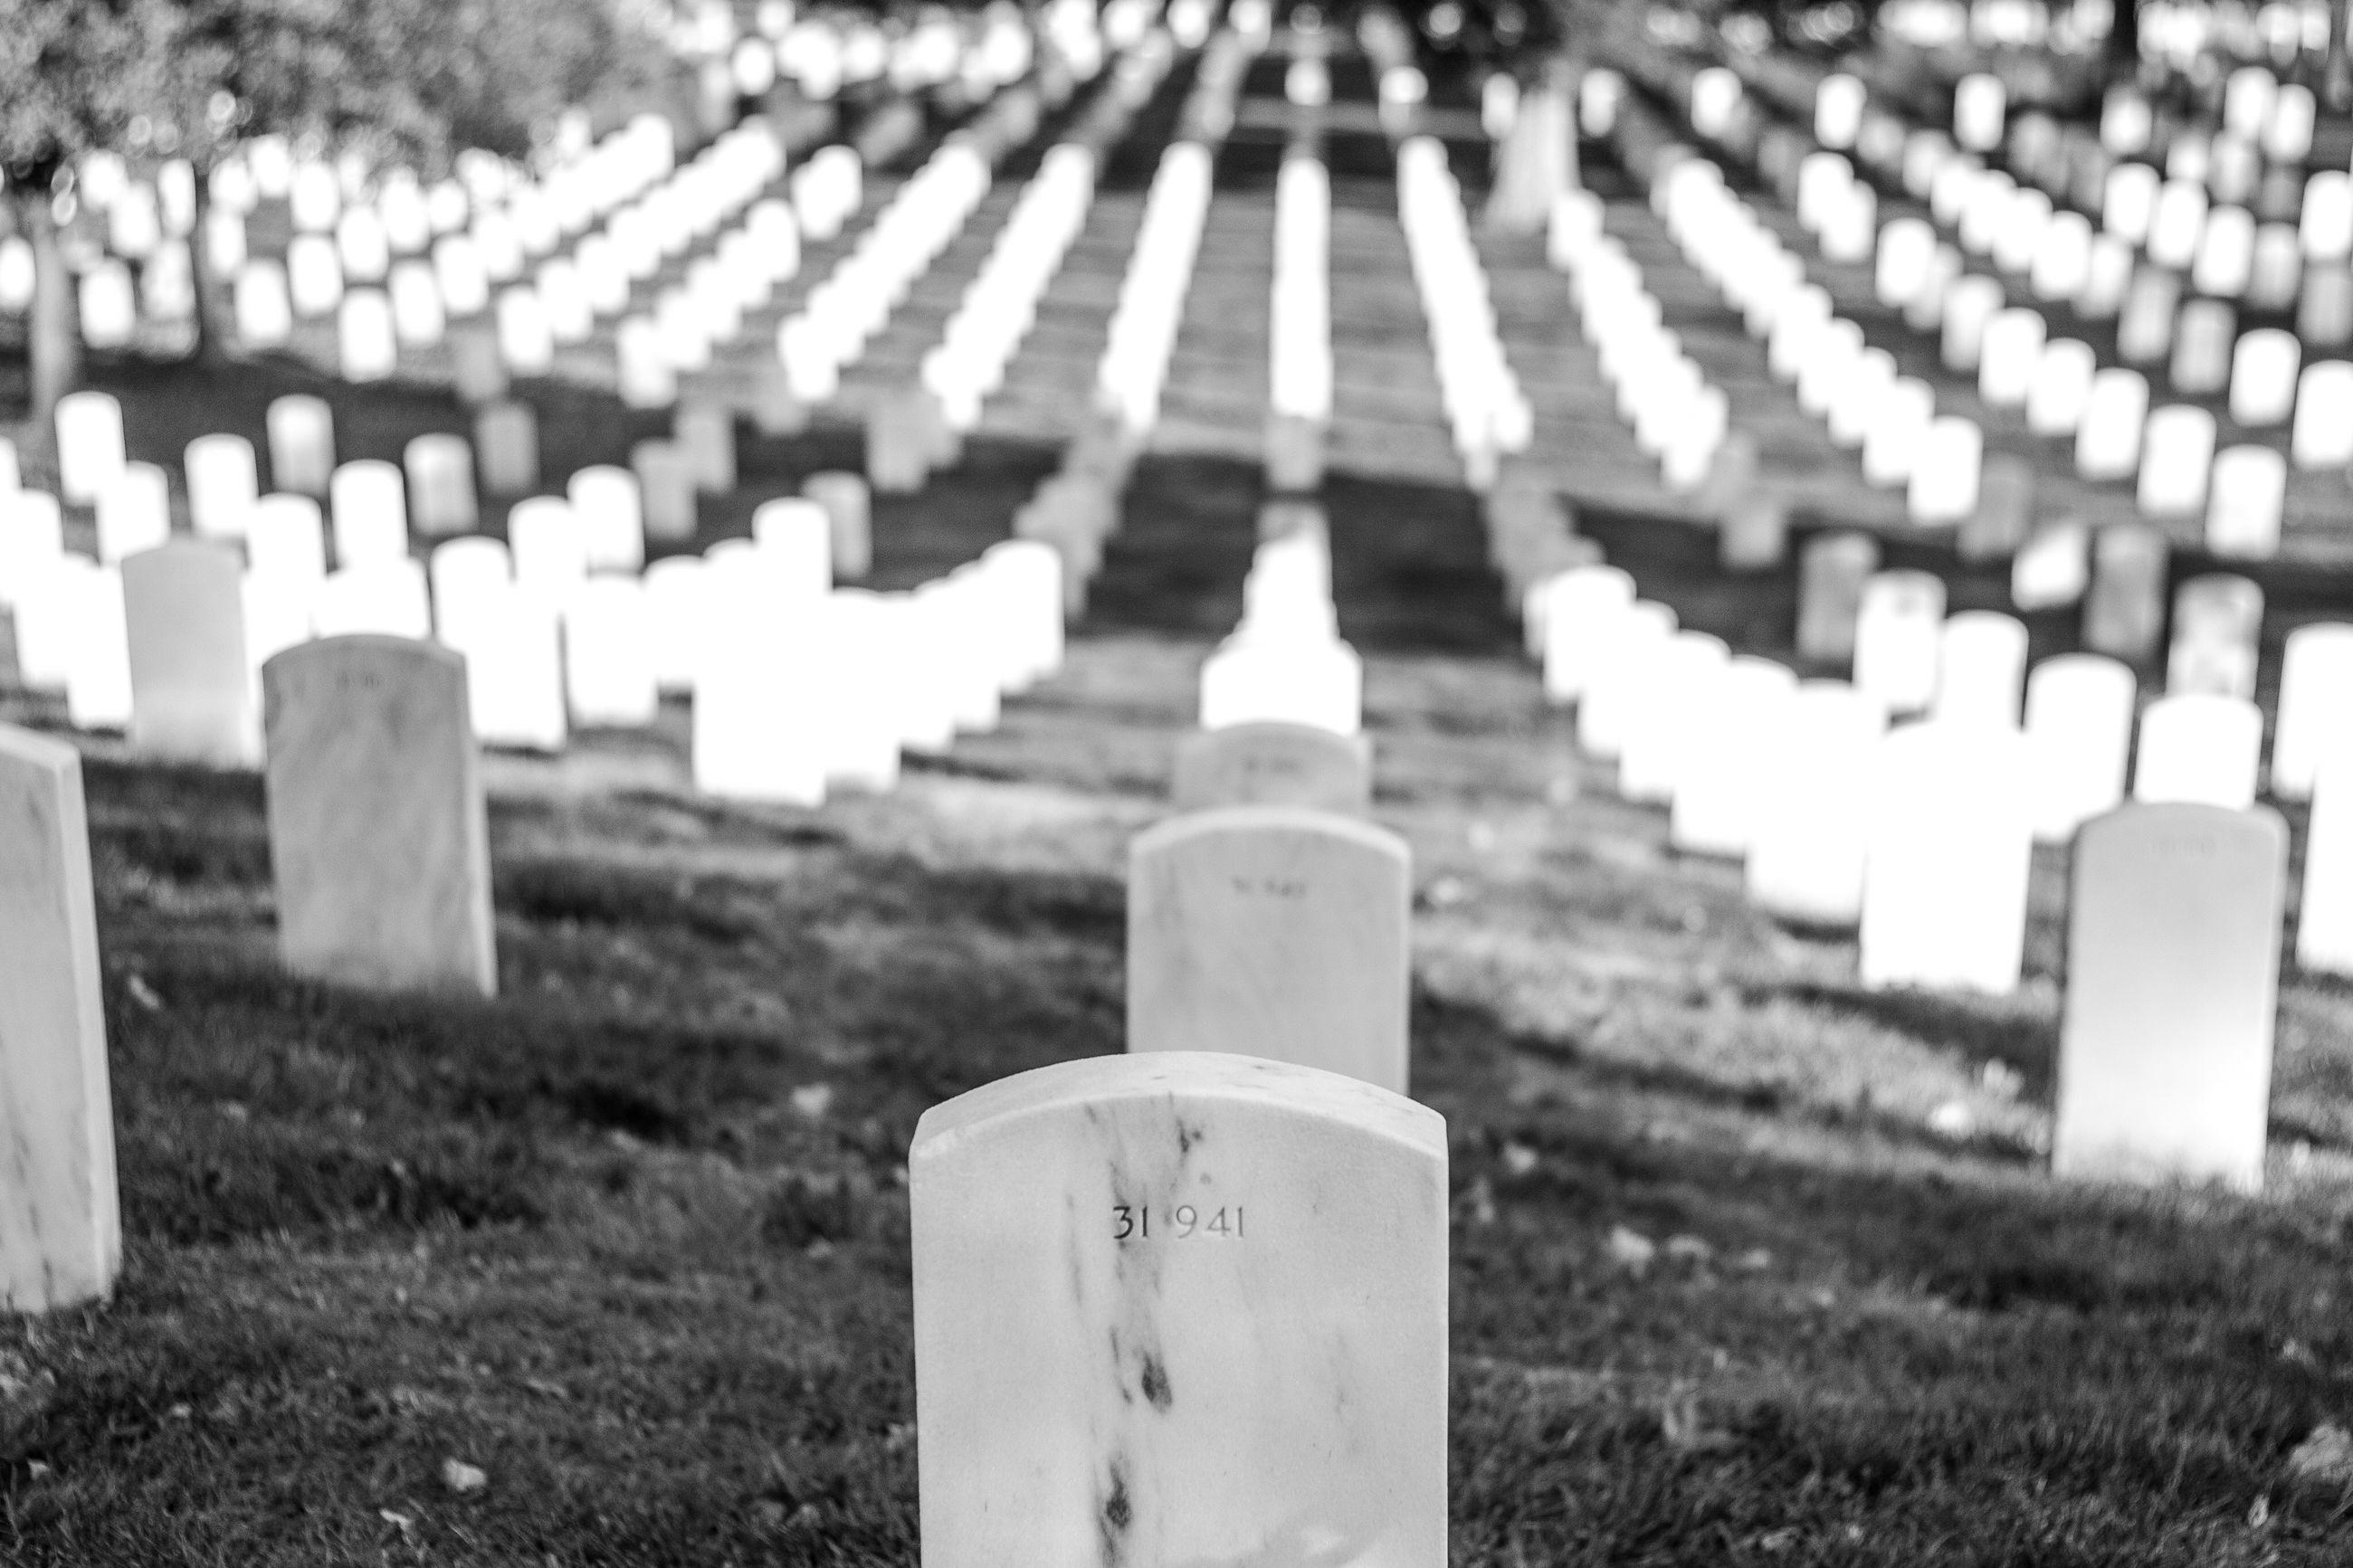 memorial, no people, close-up, war memorial, outdoors, day